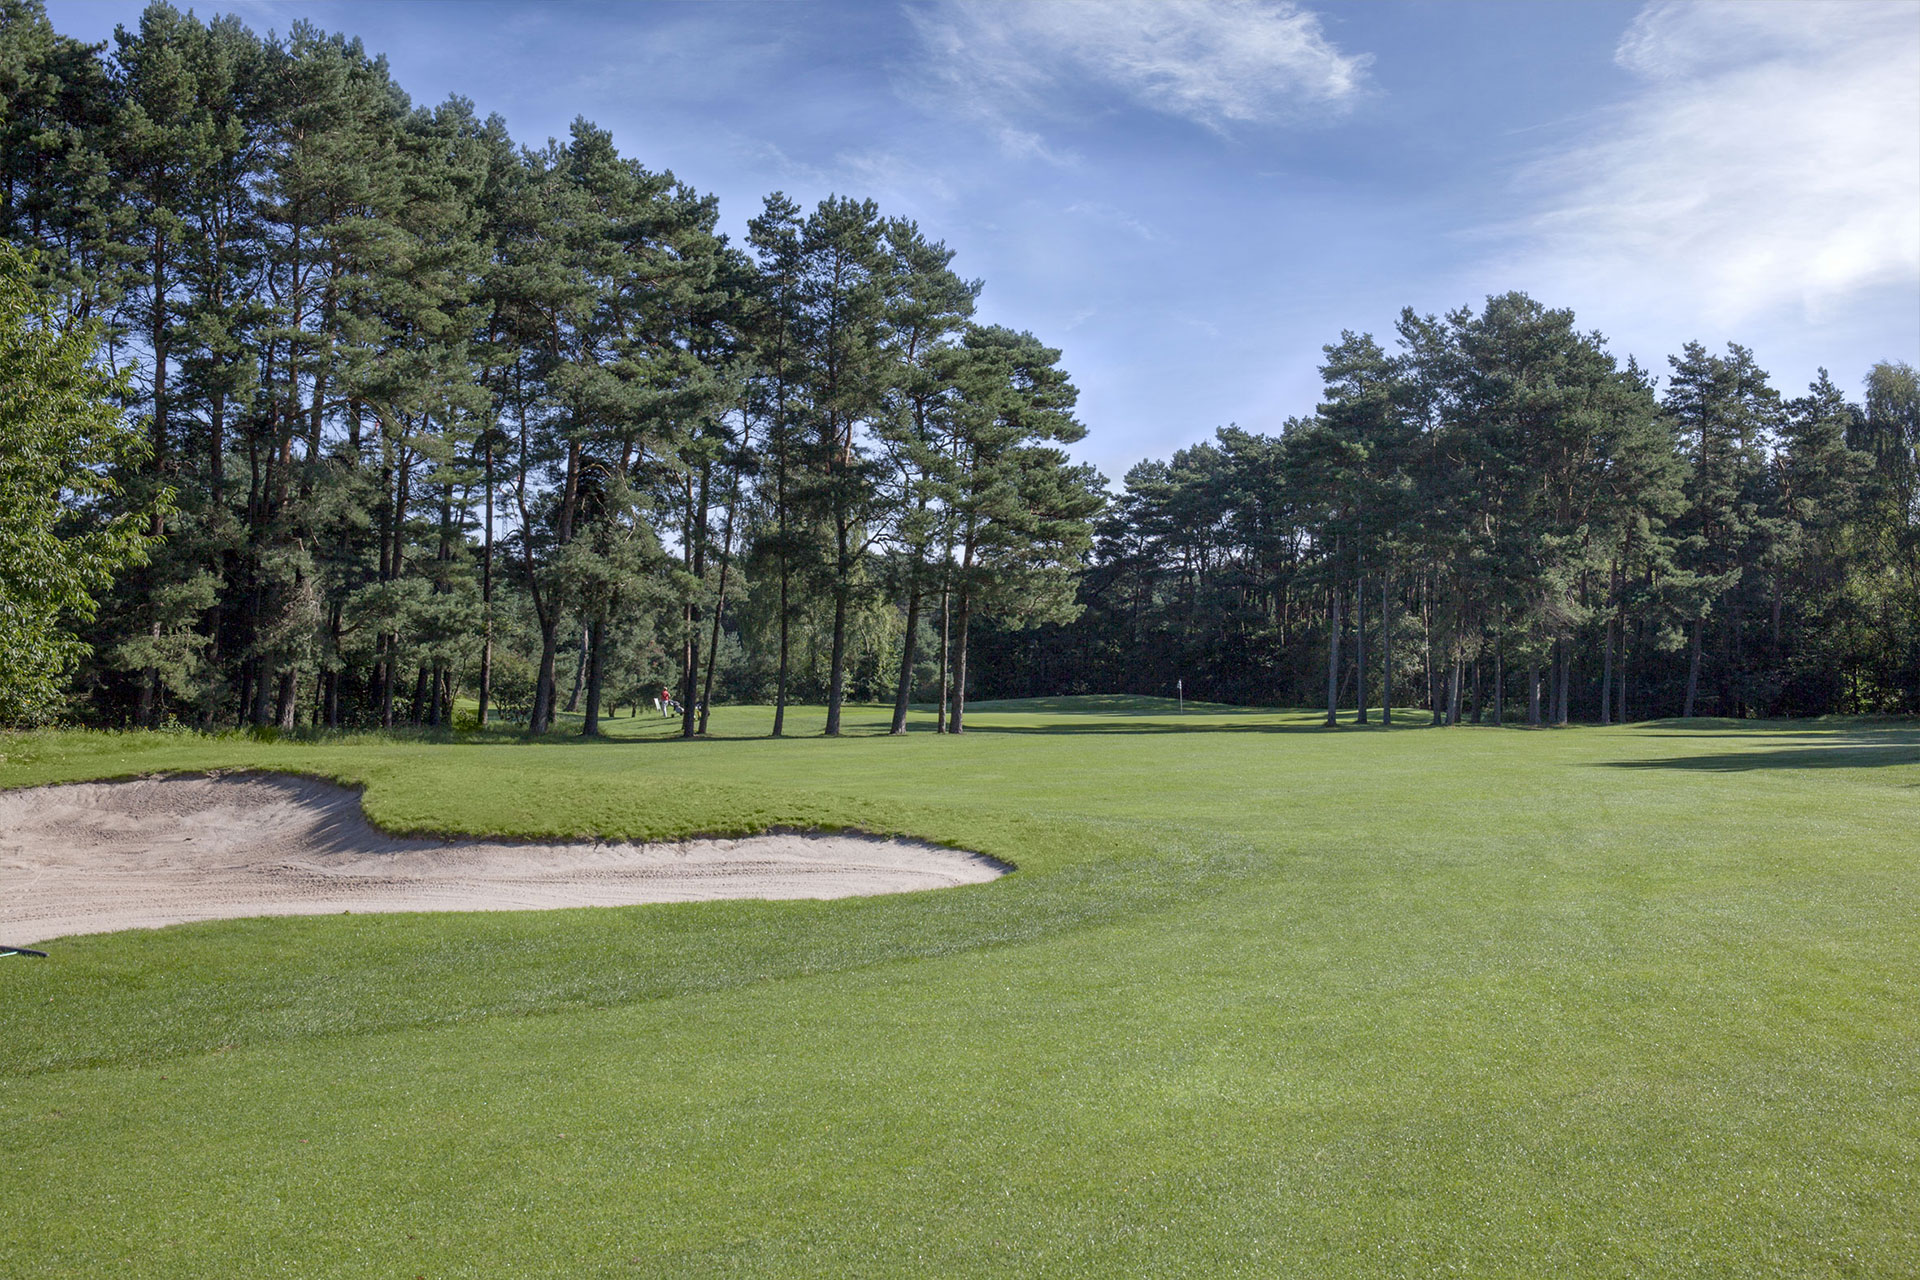 Bahn-C3-golf-verden